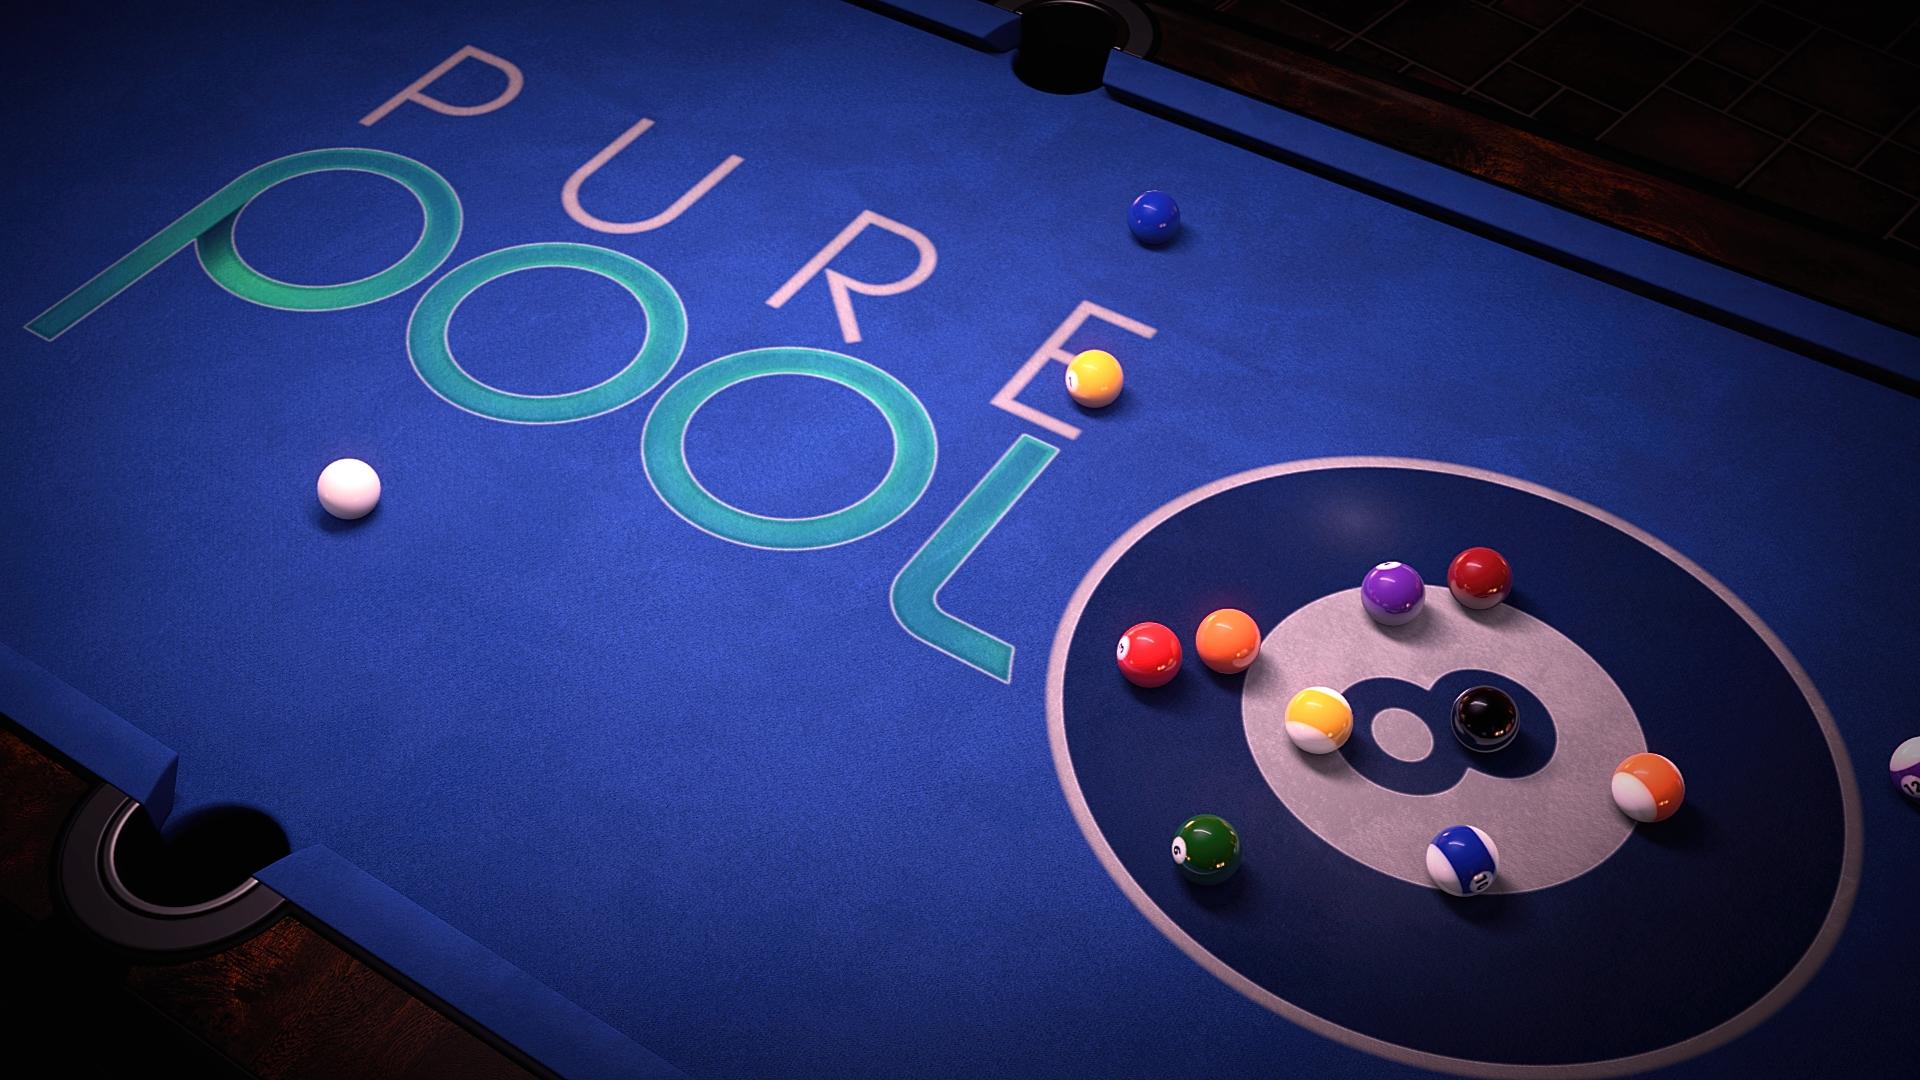 Pure Pool 9